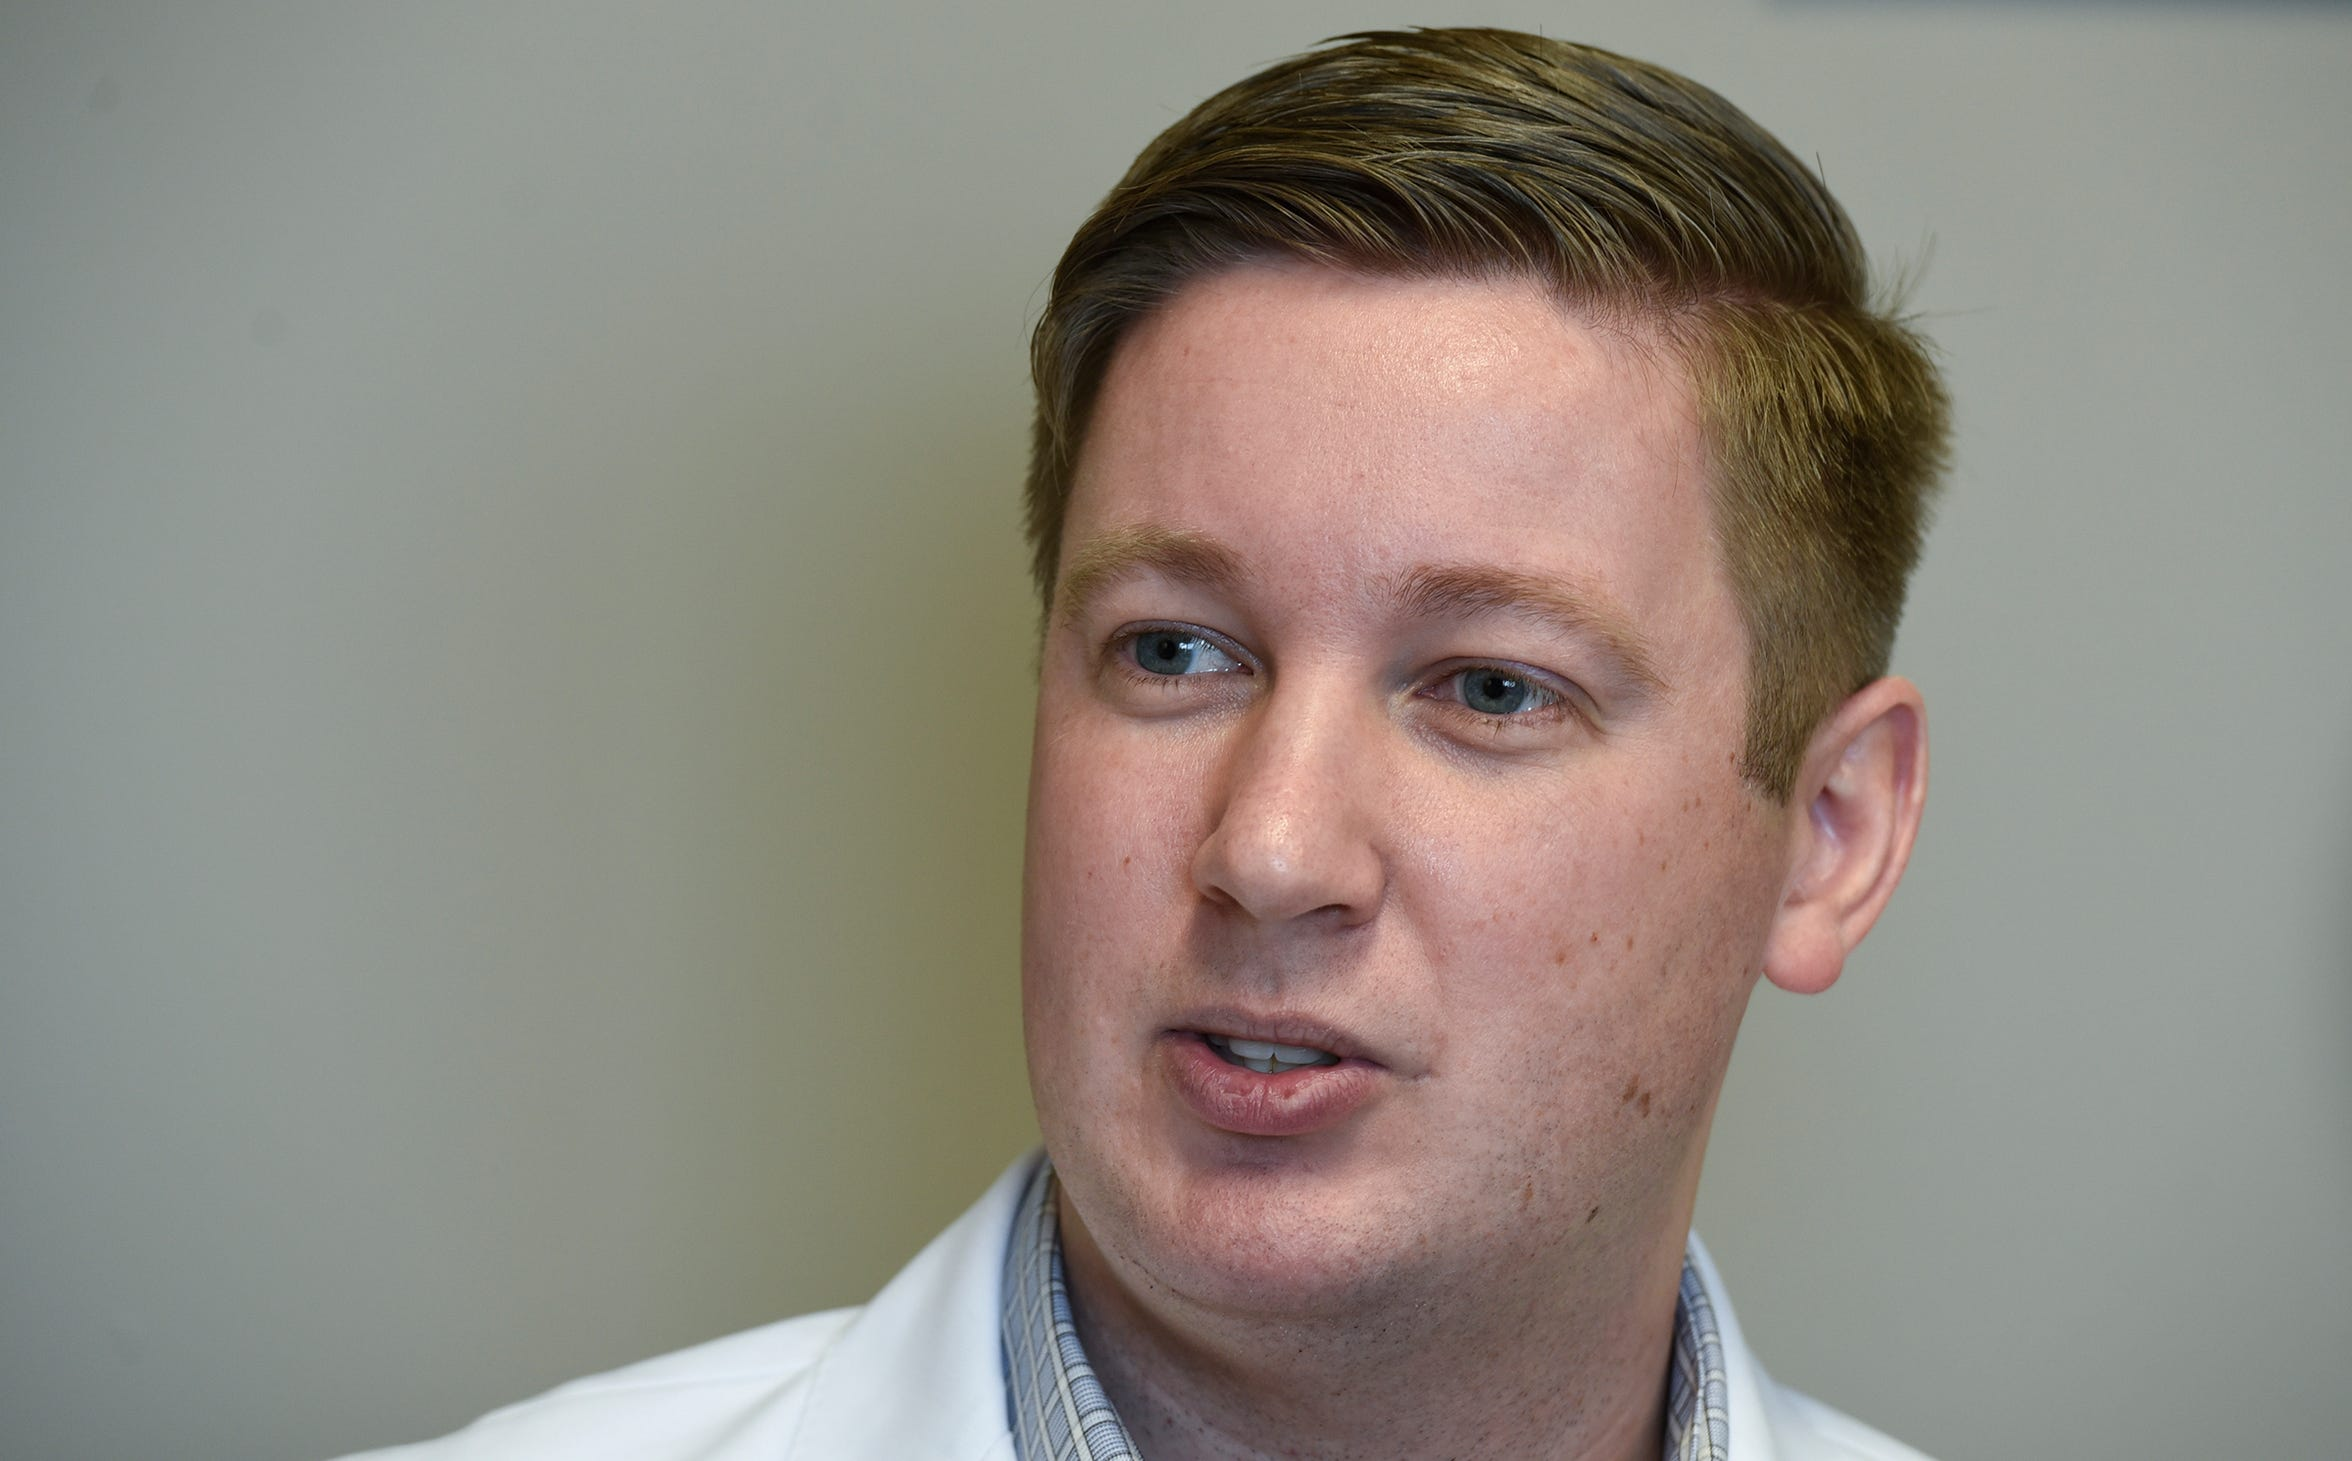 Dr. Cody Wendlandt speaks during an interview Monday, Dec. 10, at Sartell Family Medicine in Sartell.